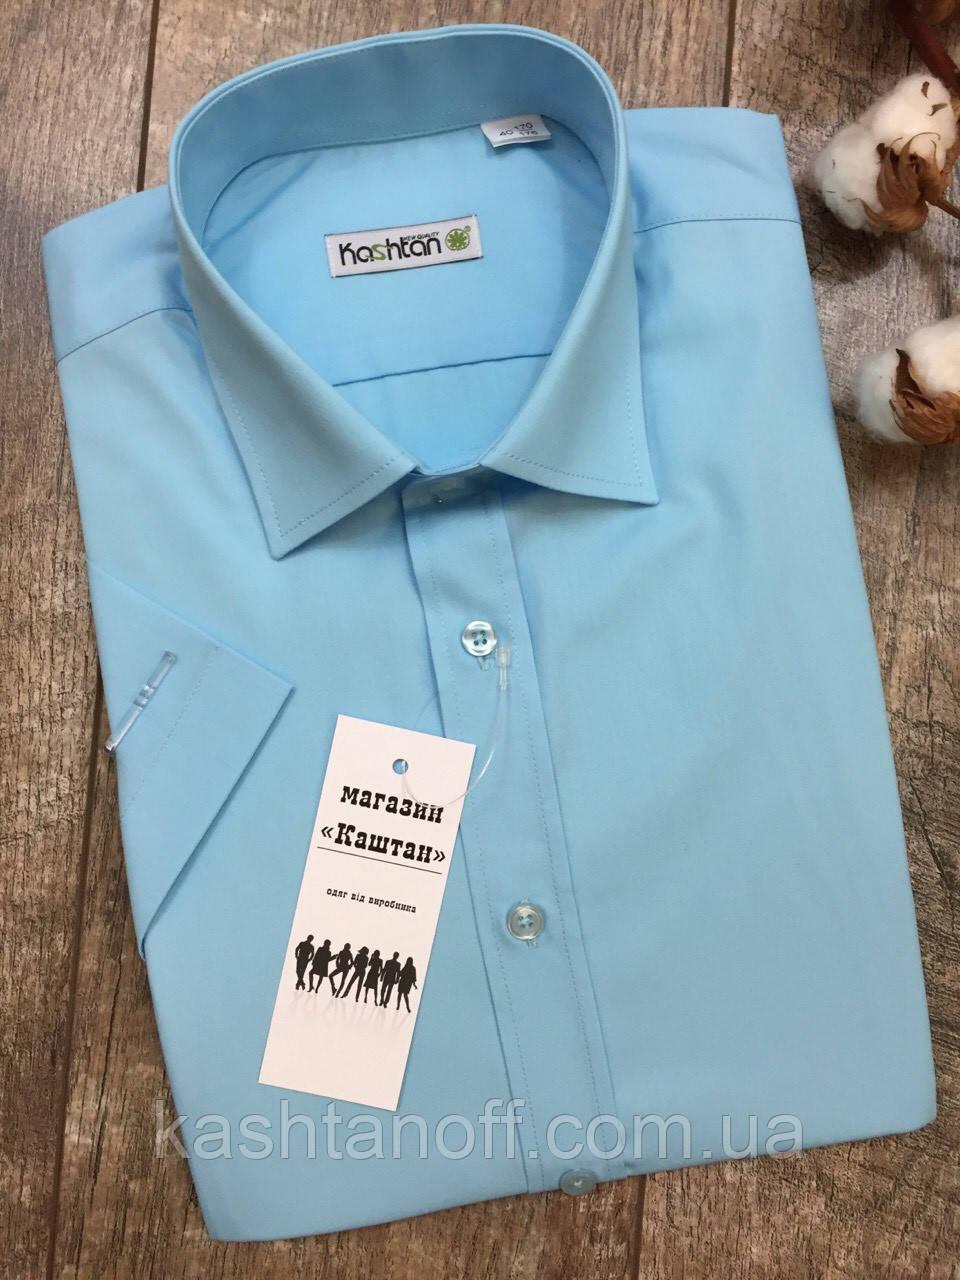 05e79f84671 Мужская рубашка цвета яркая бирюза - Интернет-магазин КАШТАН Мужская